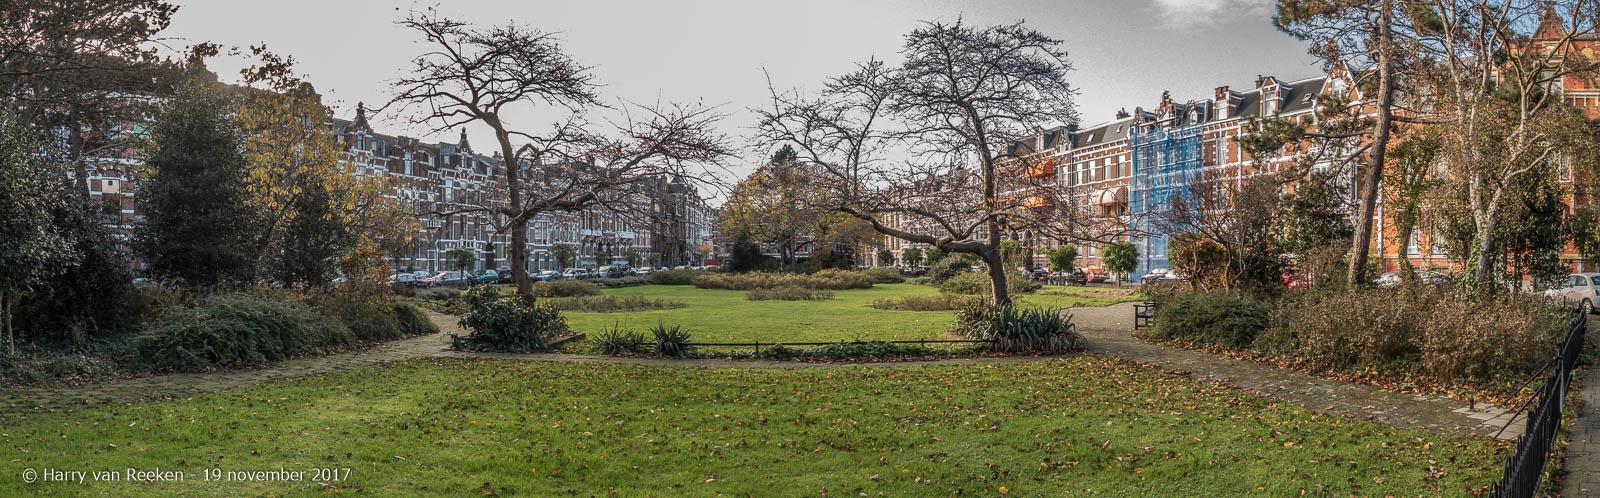 Sweelinckplein - Duinoord-Pano